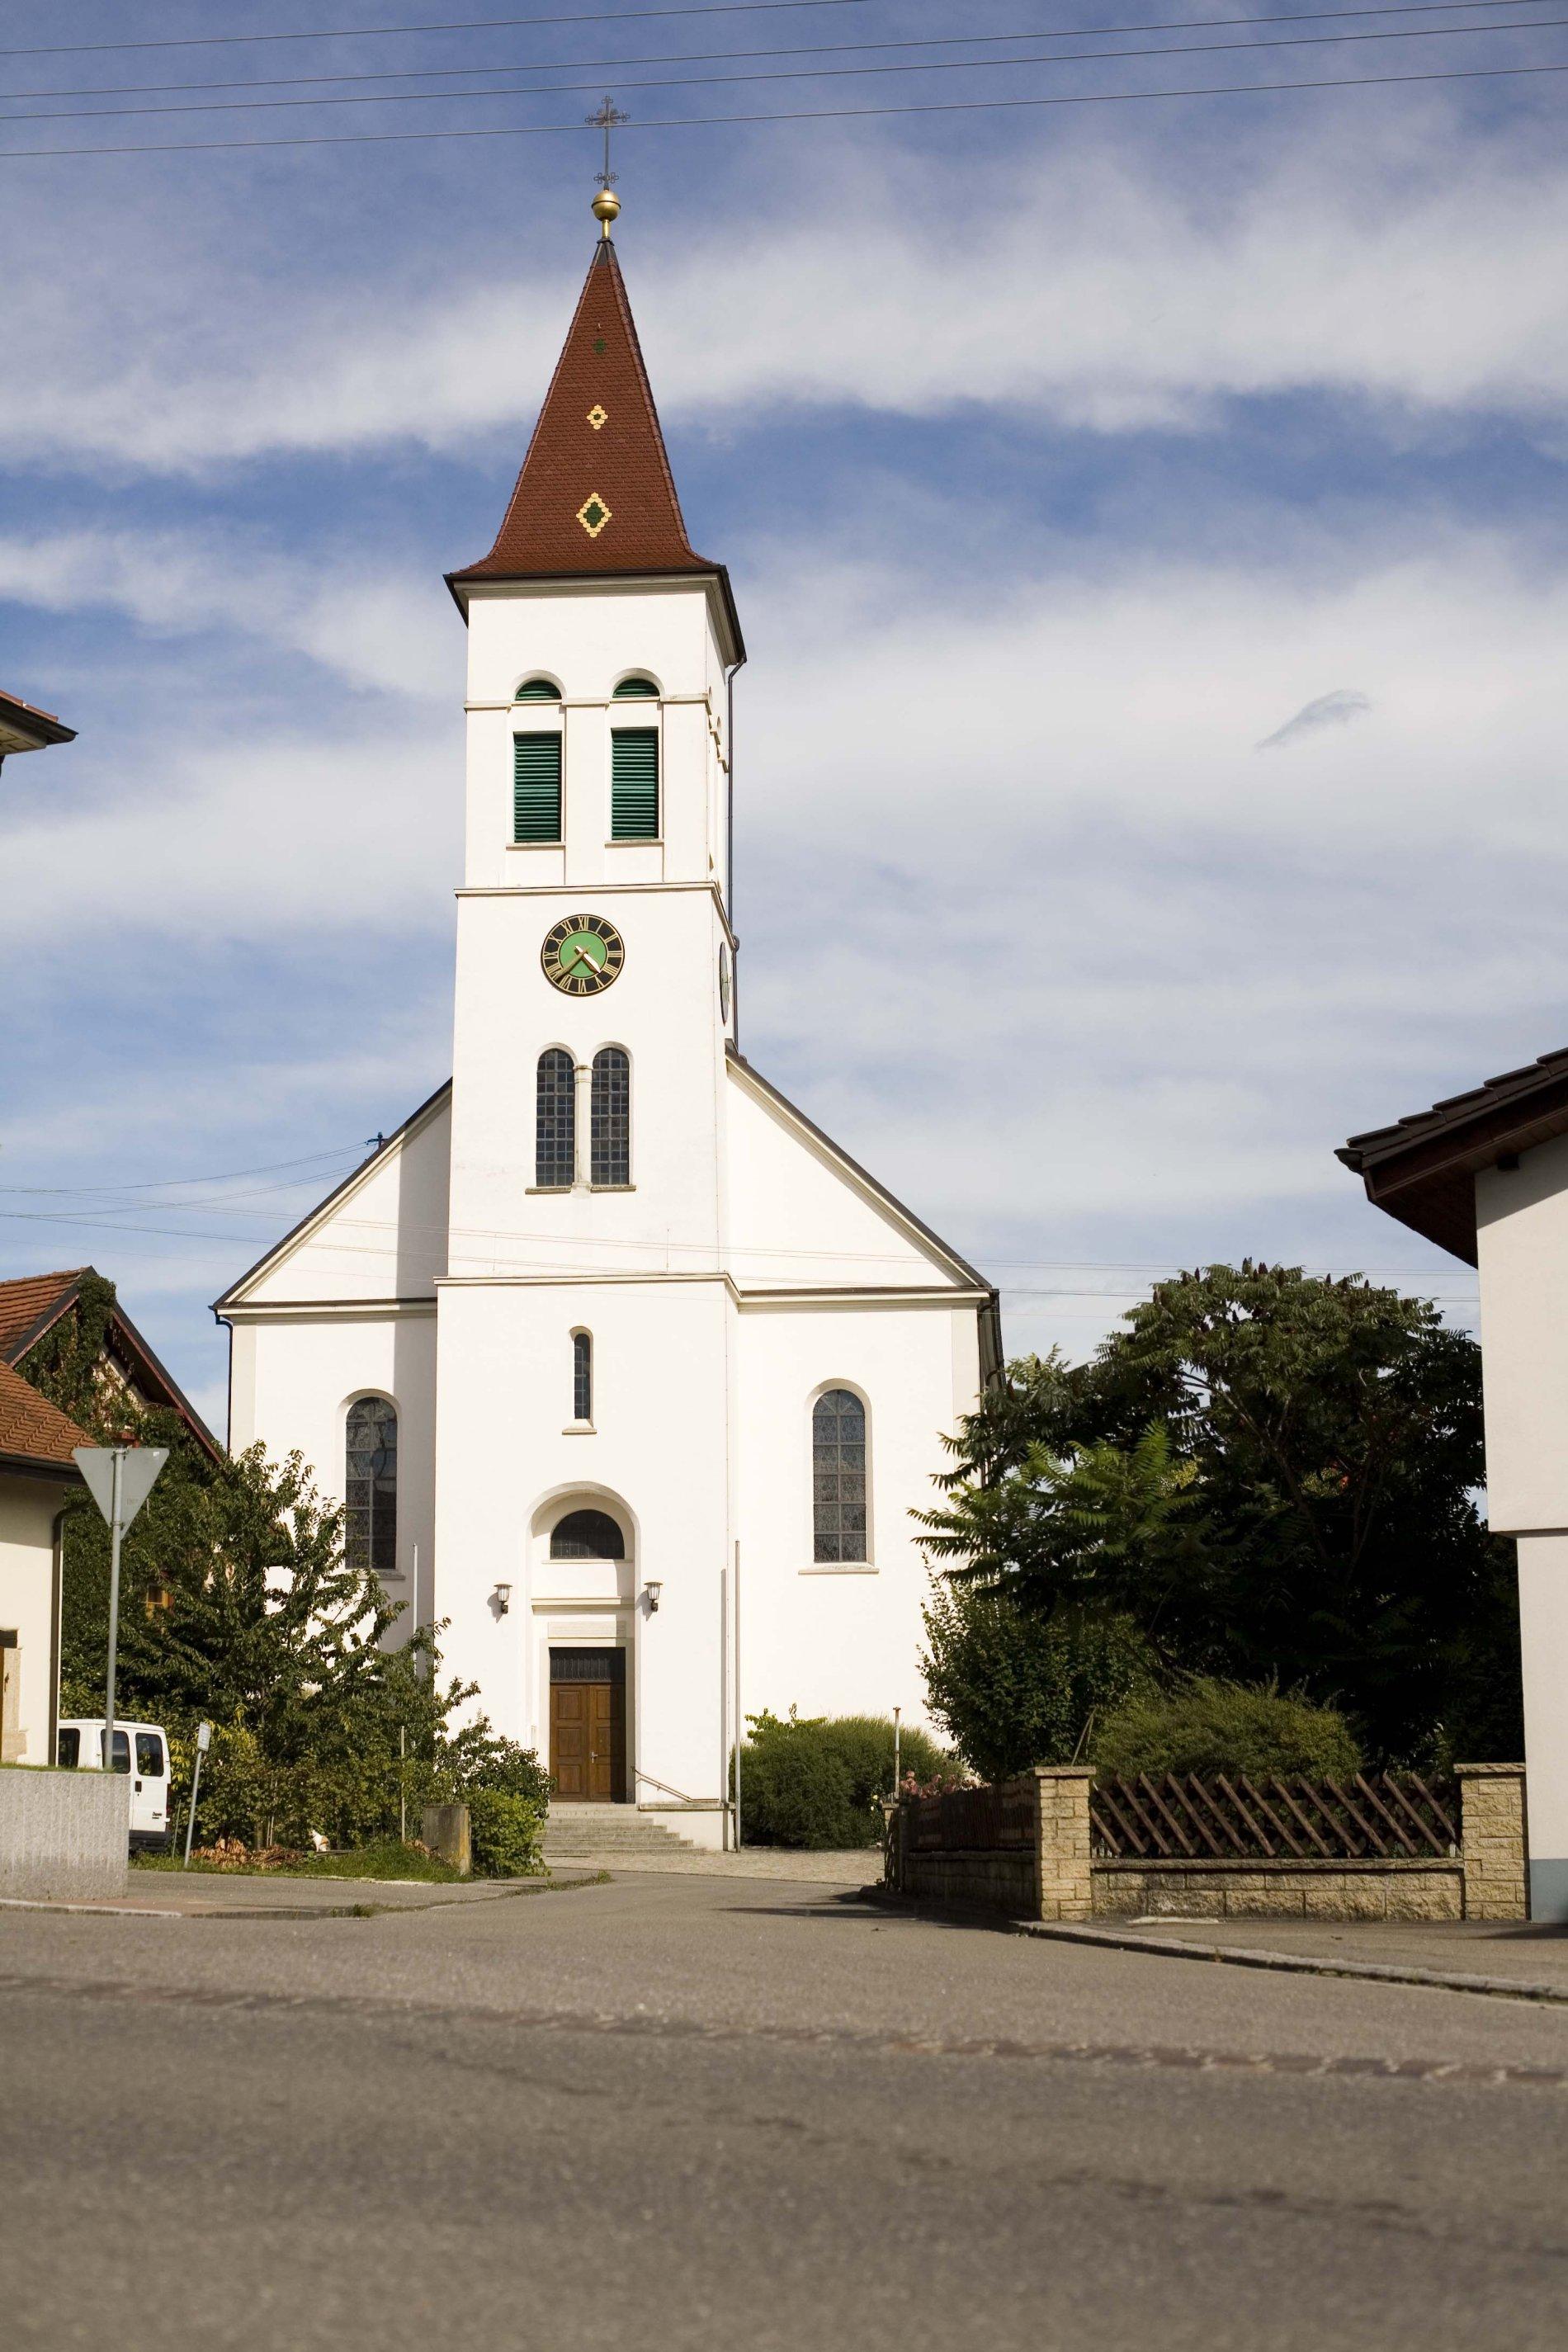 Pfarrkirche St. Mauritius Eigeltingen